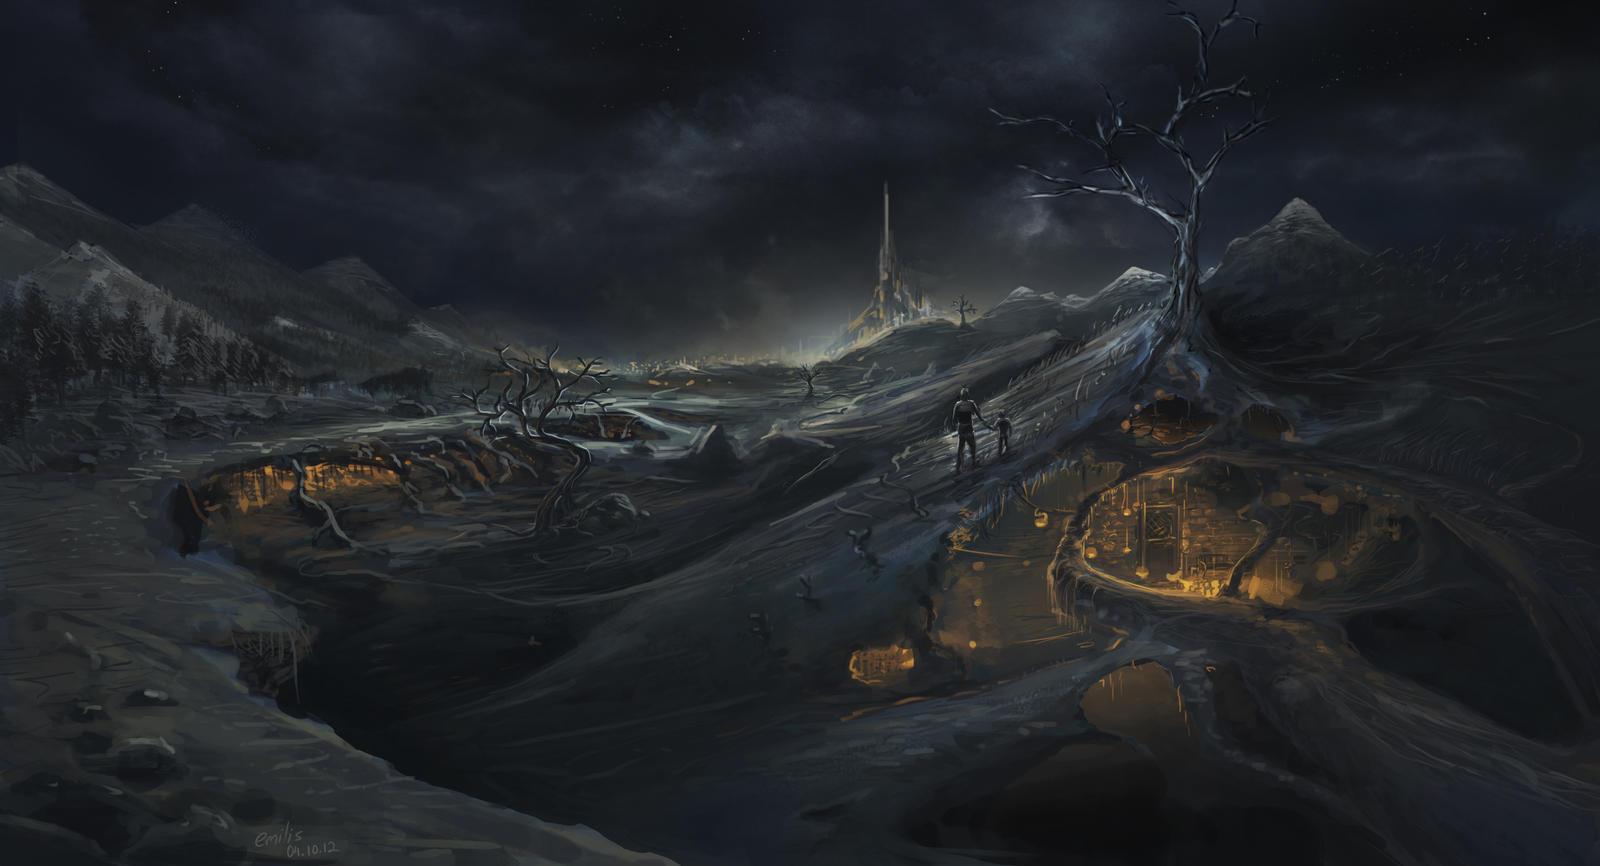 The Haunted by EmilisB